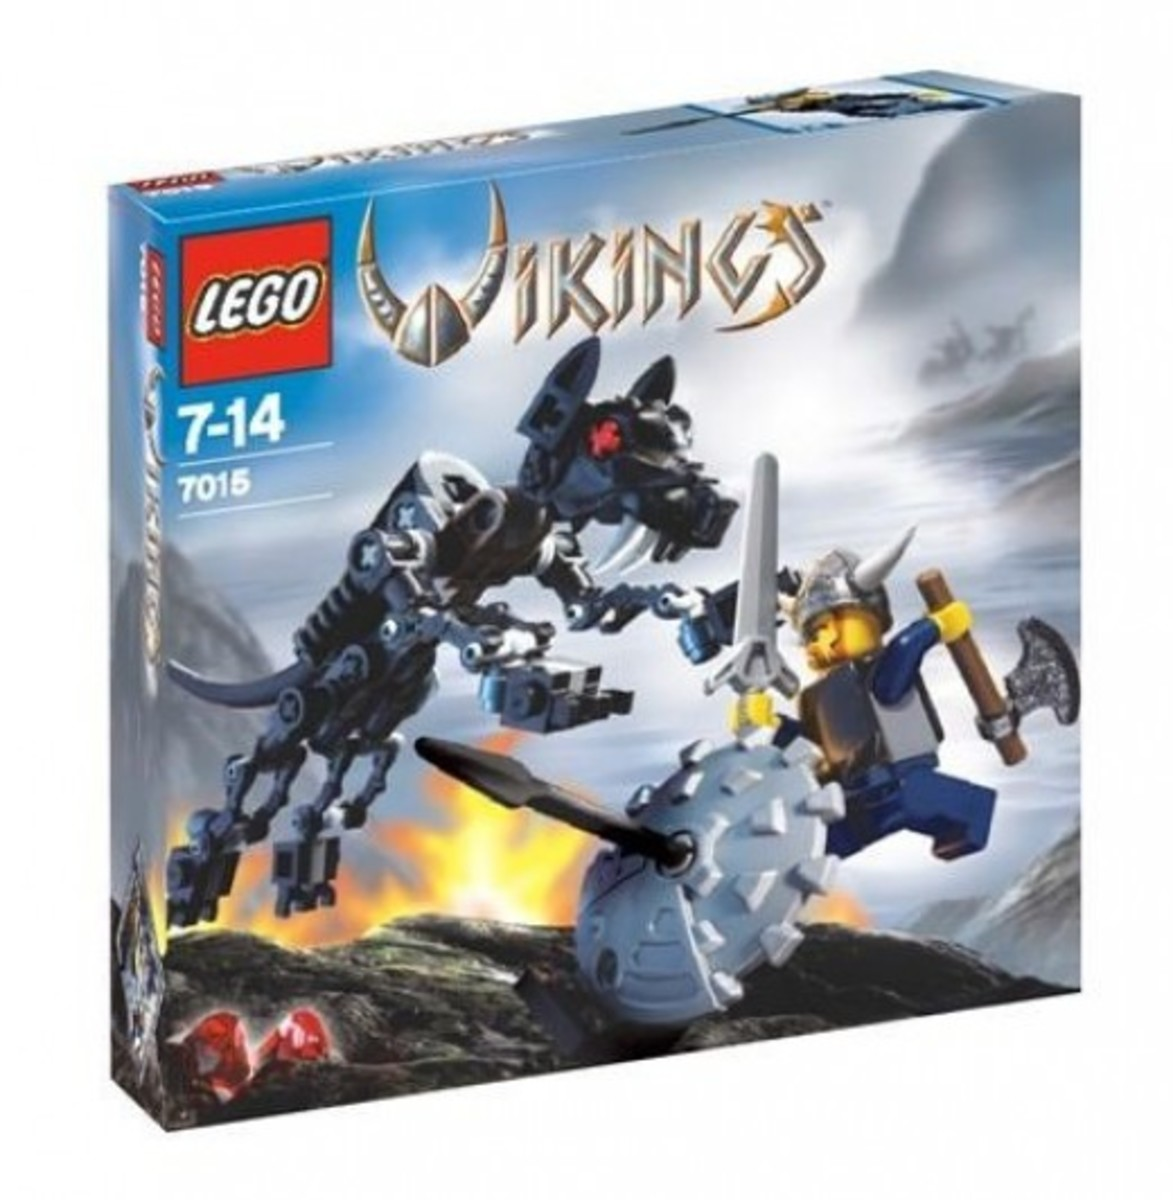 LEGO Vikings Viking Warrior Challenges The Fenris Wolf 7015 Box